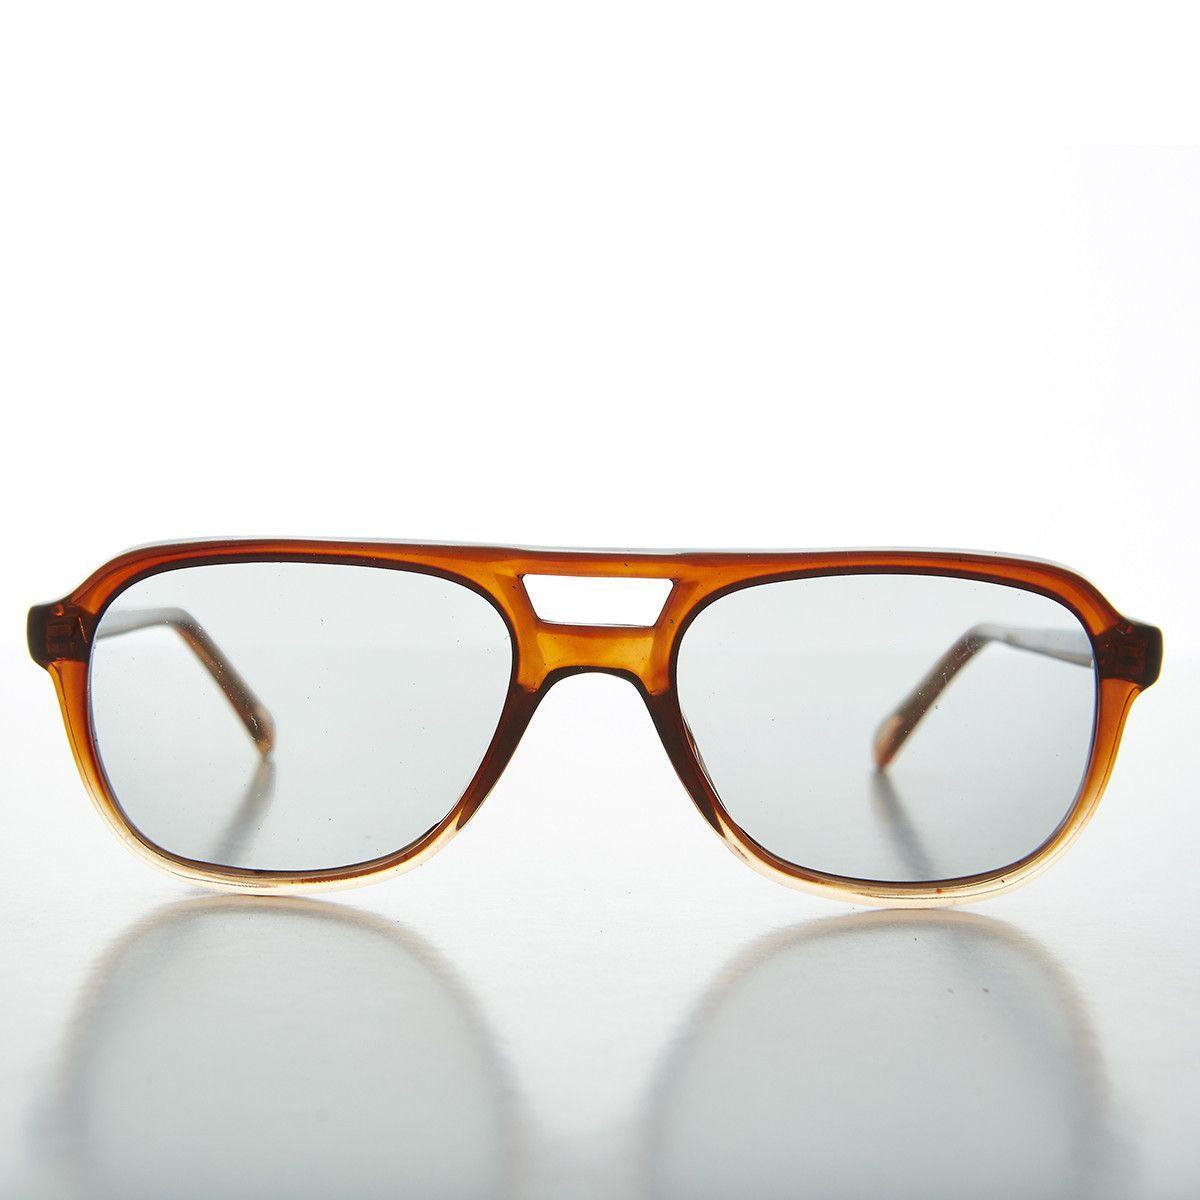 Eyeglasses dallas - Small Square Vintage Aviator Sunglass With Transition Corning Lens Dallas